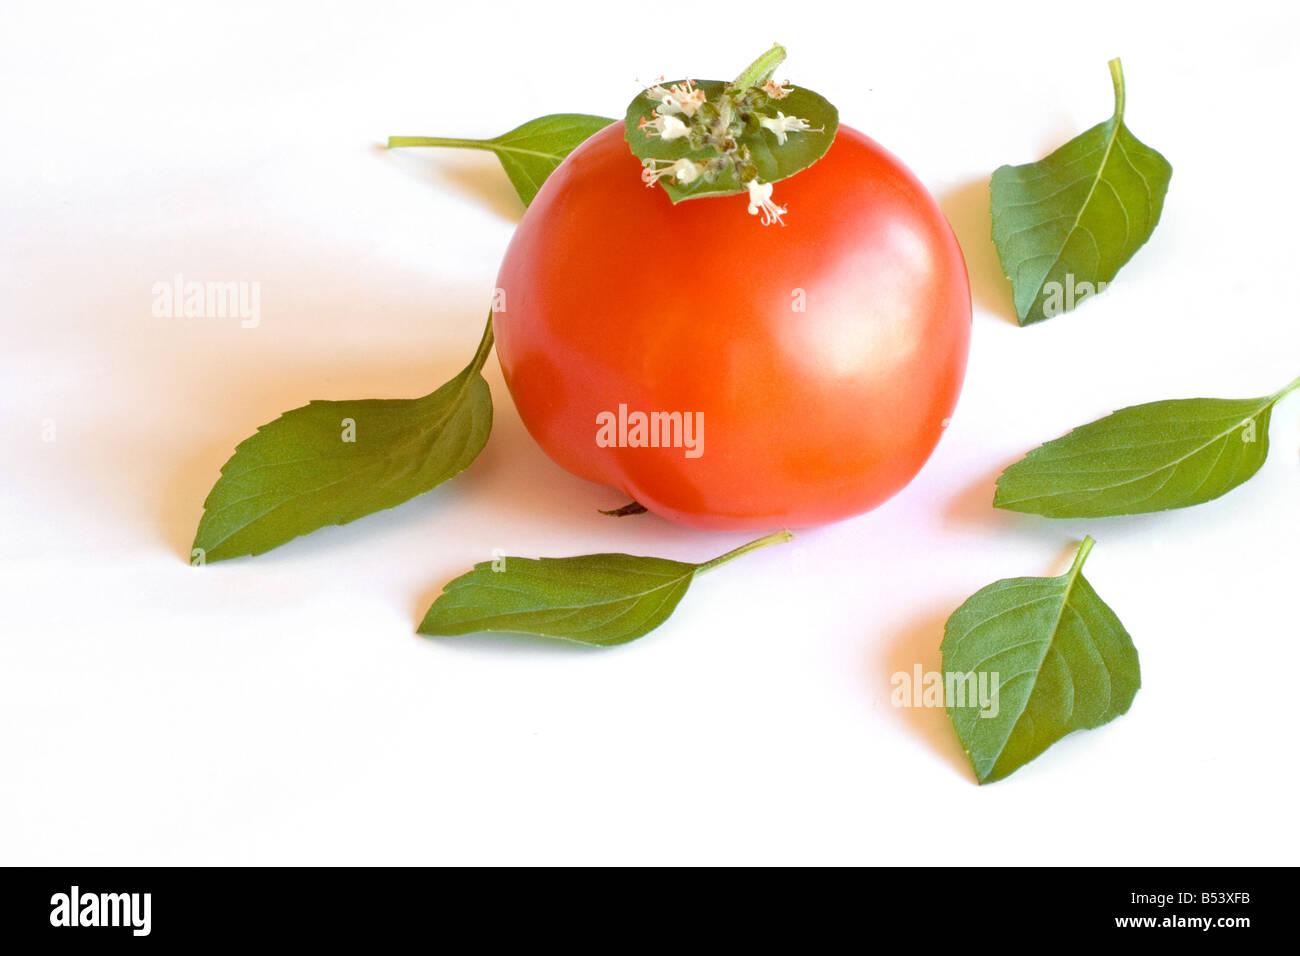 Tomato and basil - Stock Image